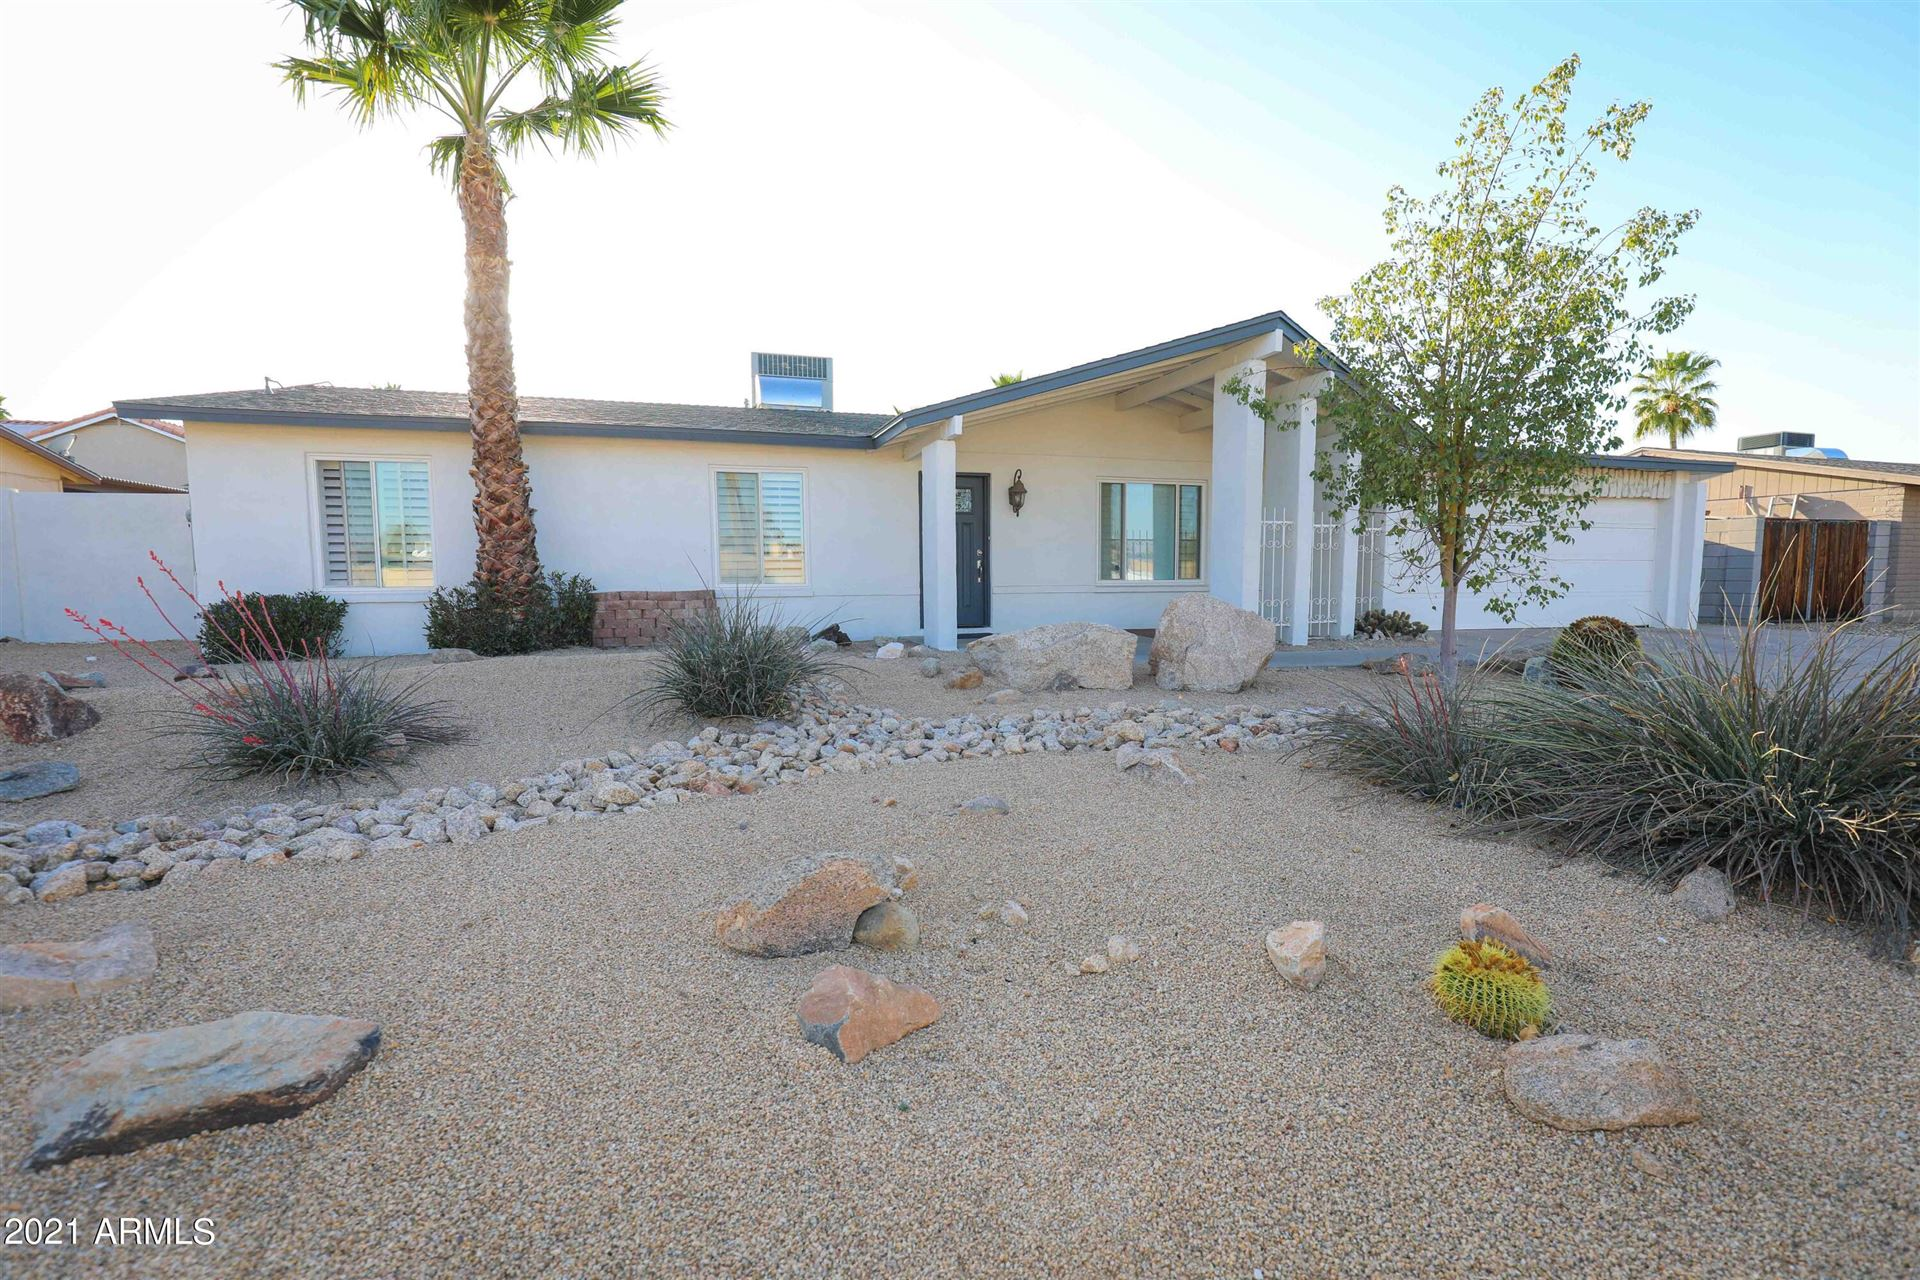 11608 N 32ND Place, Phoenix, AZ 85028 - MLS#: 6211461